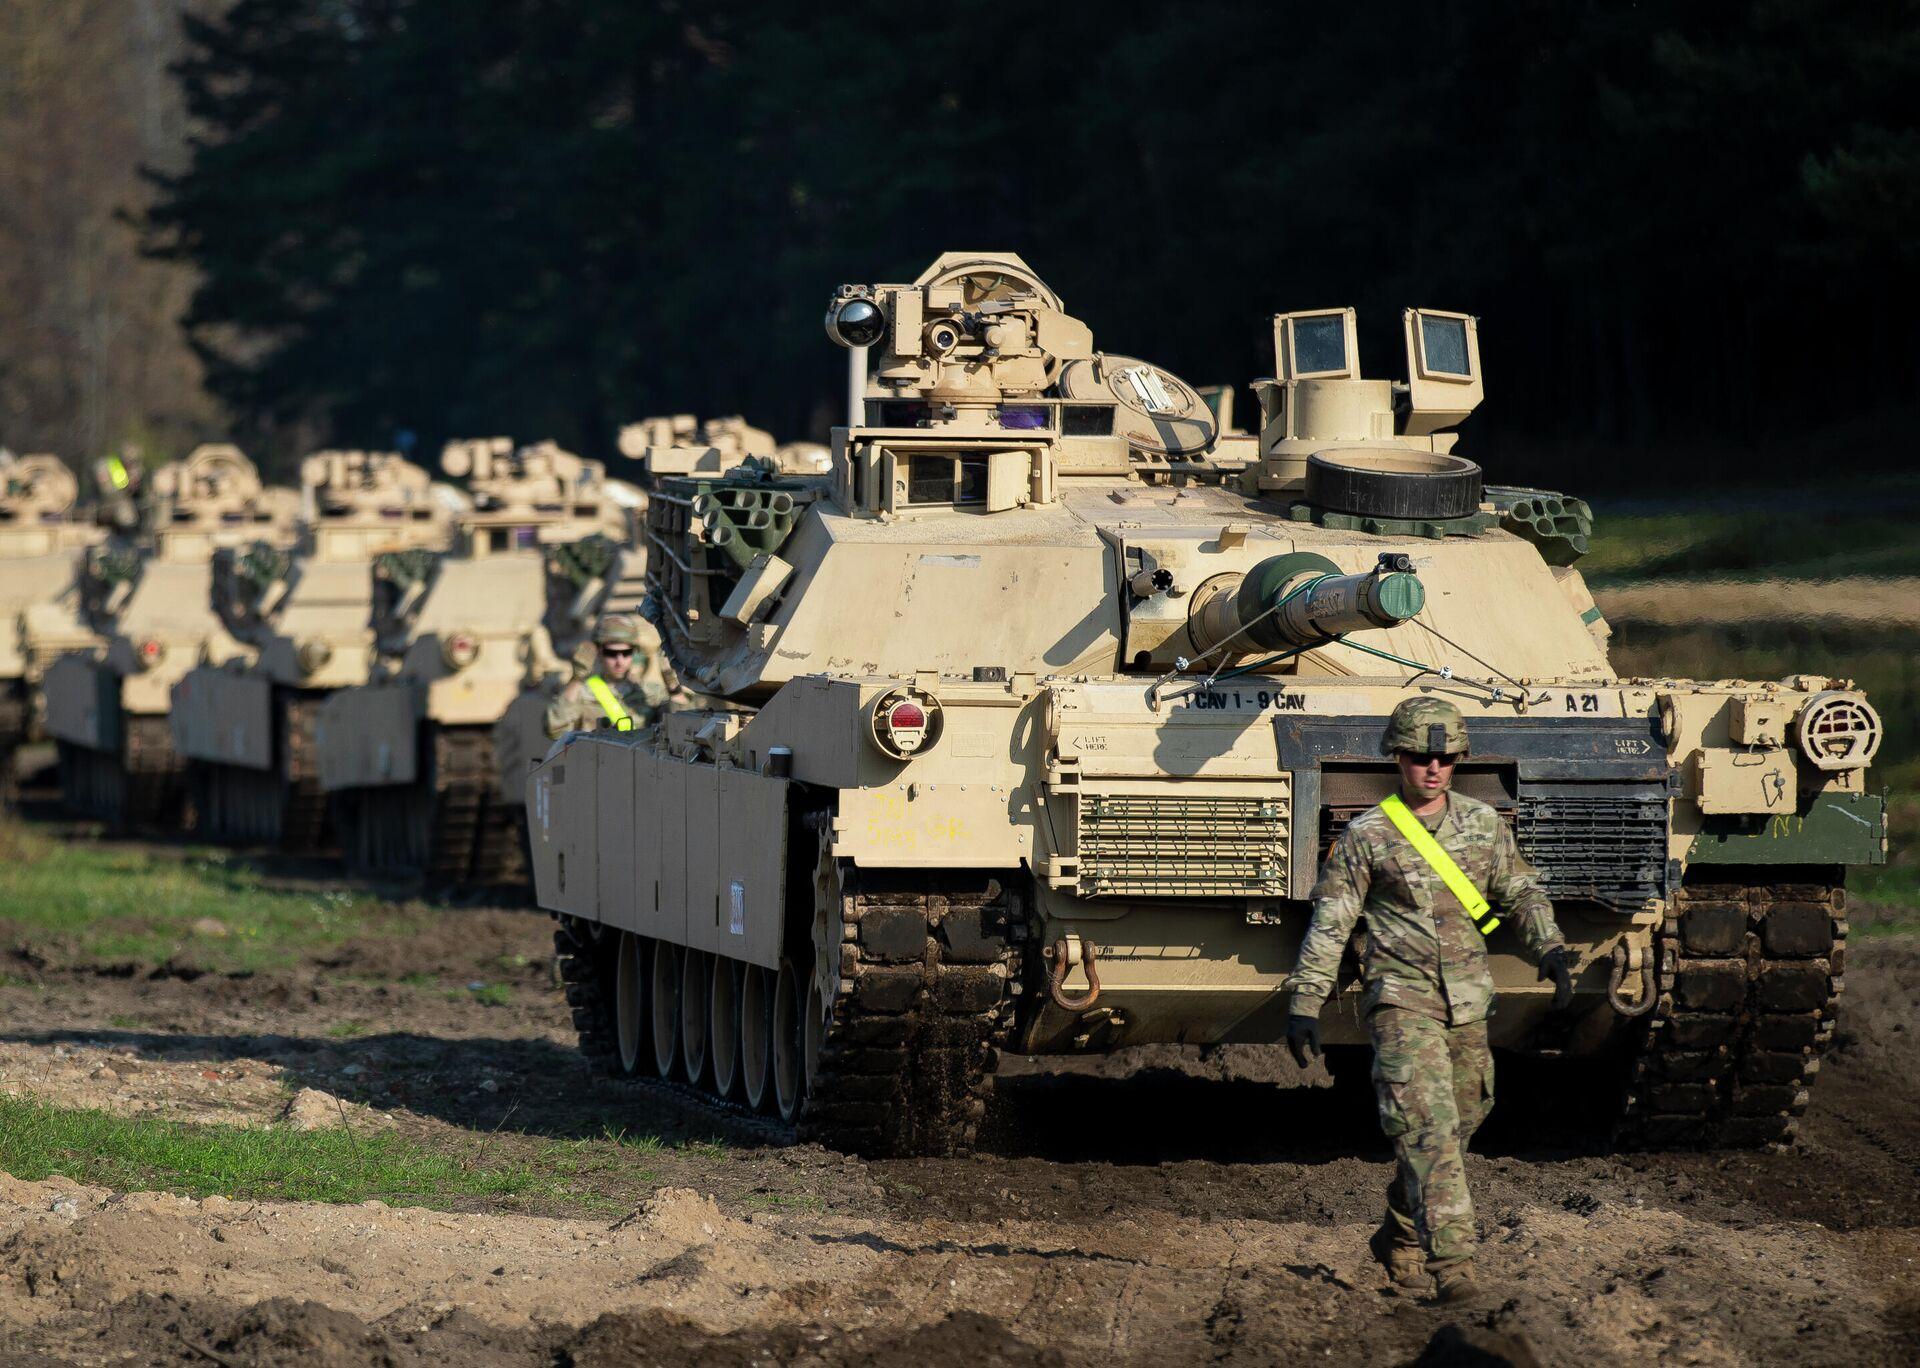 Американские танки Абрамс в городе Пабраде, Литва. 21 октября 2019 - РИА Новости, 1920, 02.02.2021